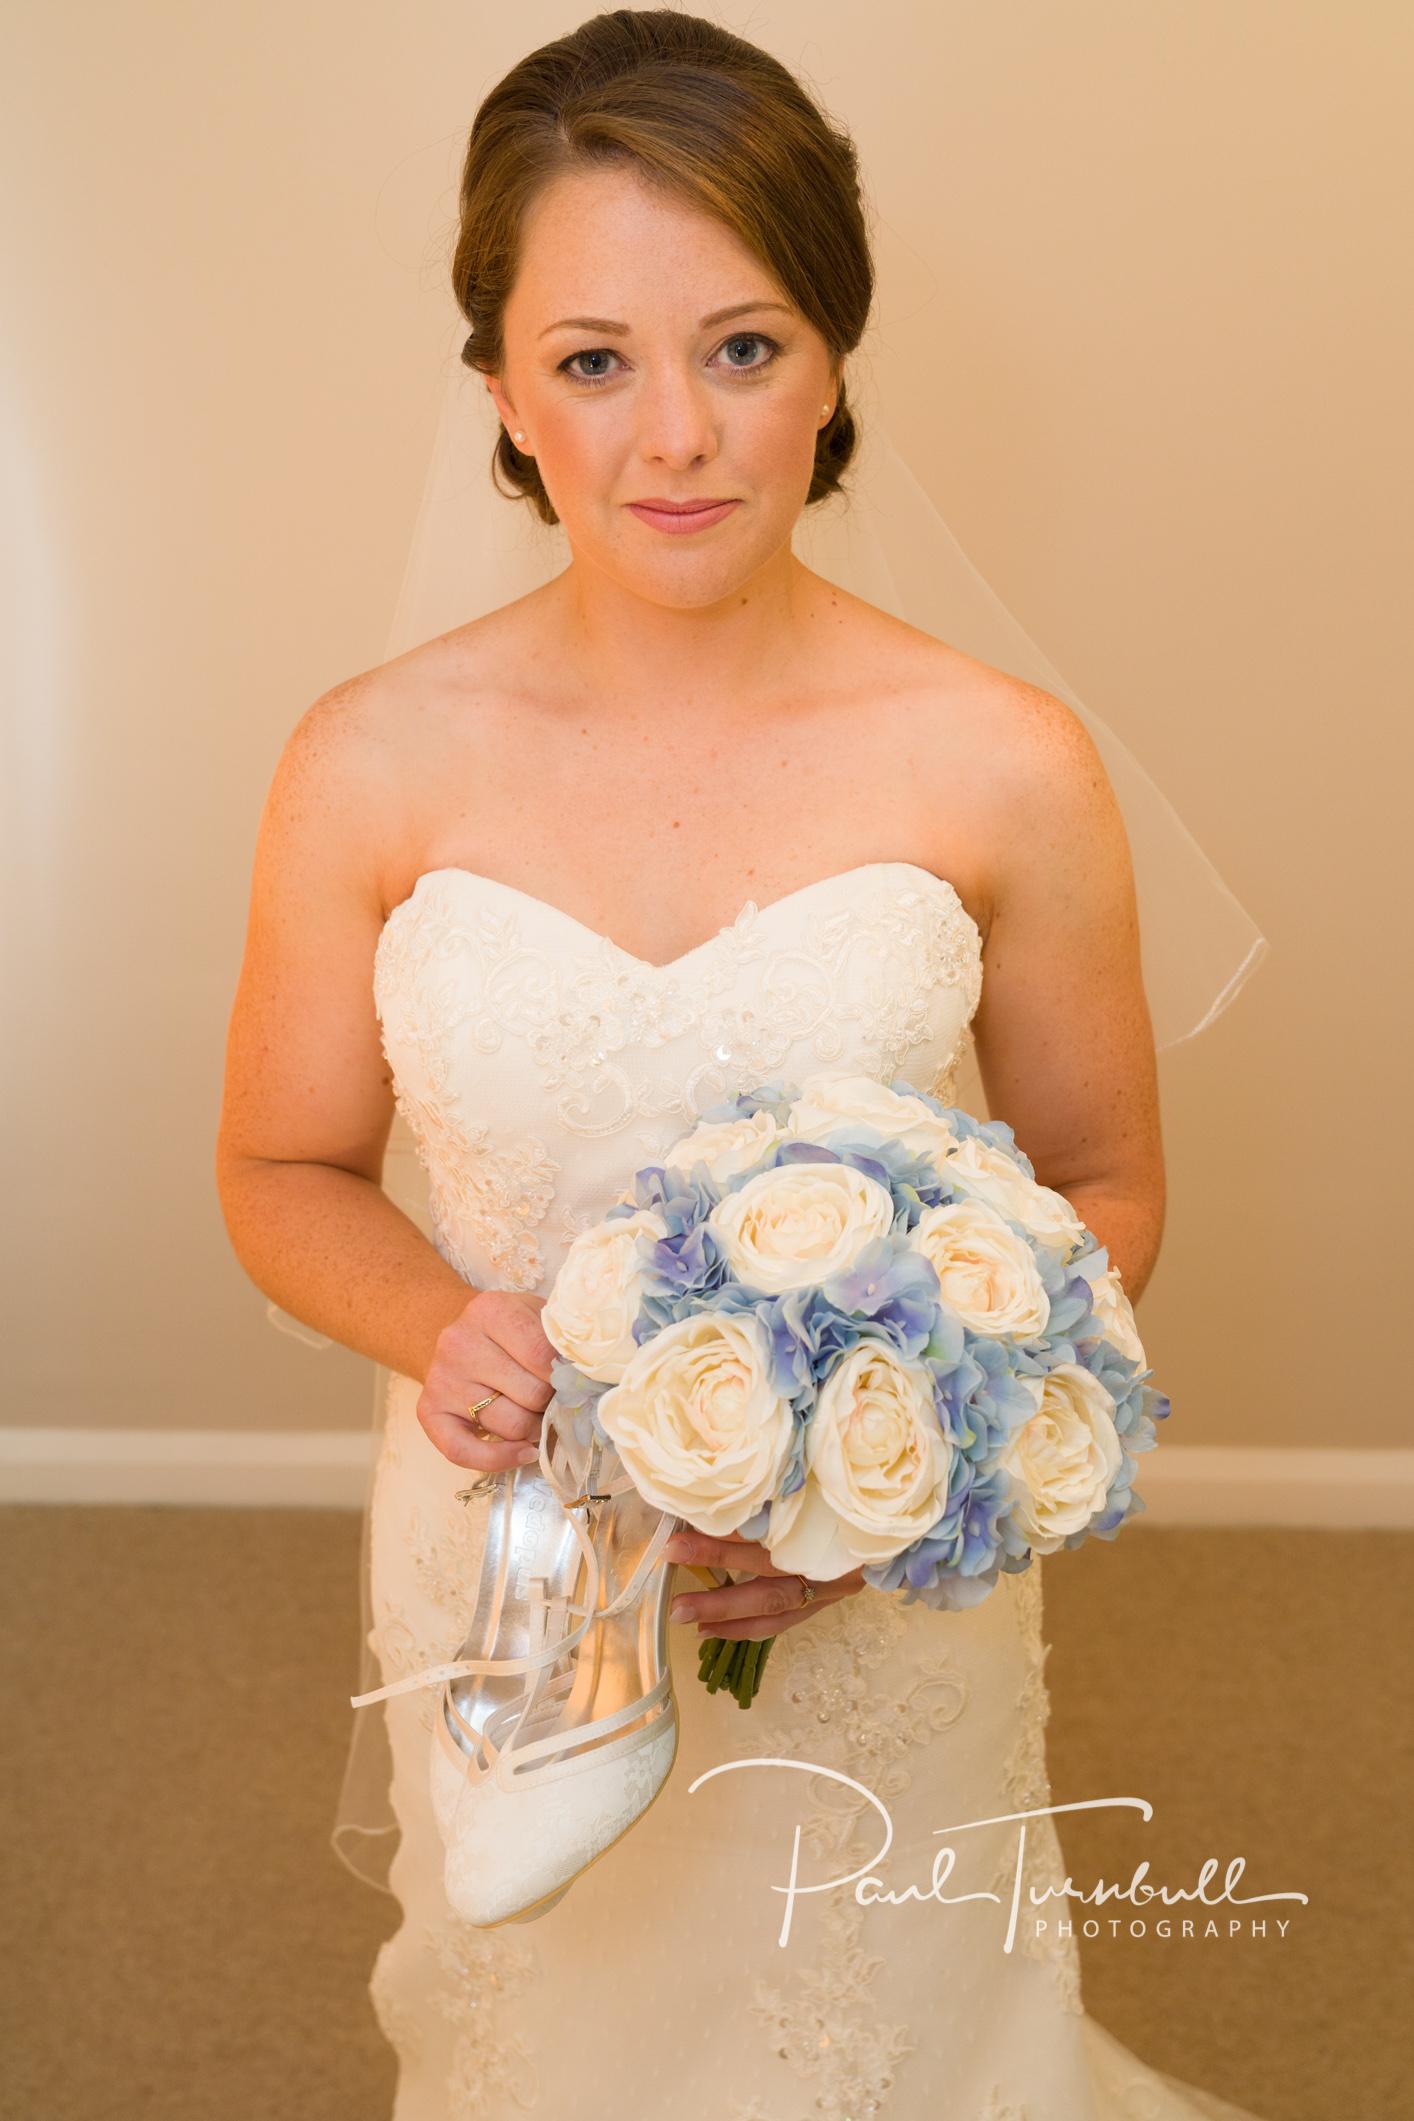 wedding-photographer-south-dalton-walkington-yorkshire-emma-james-016.jpg